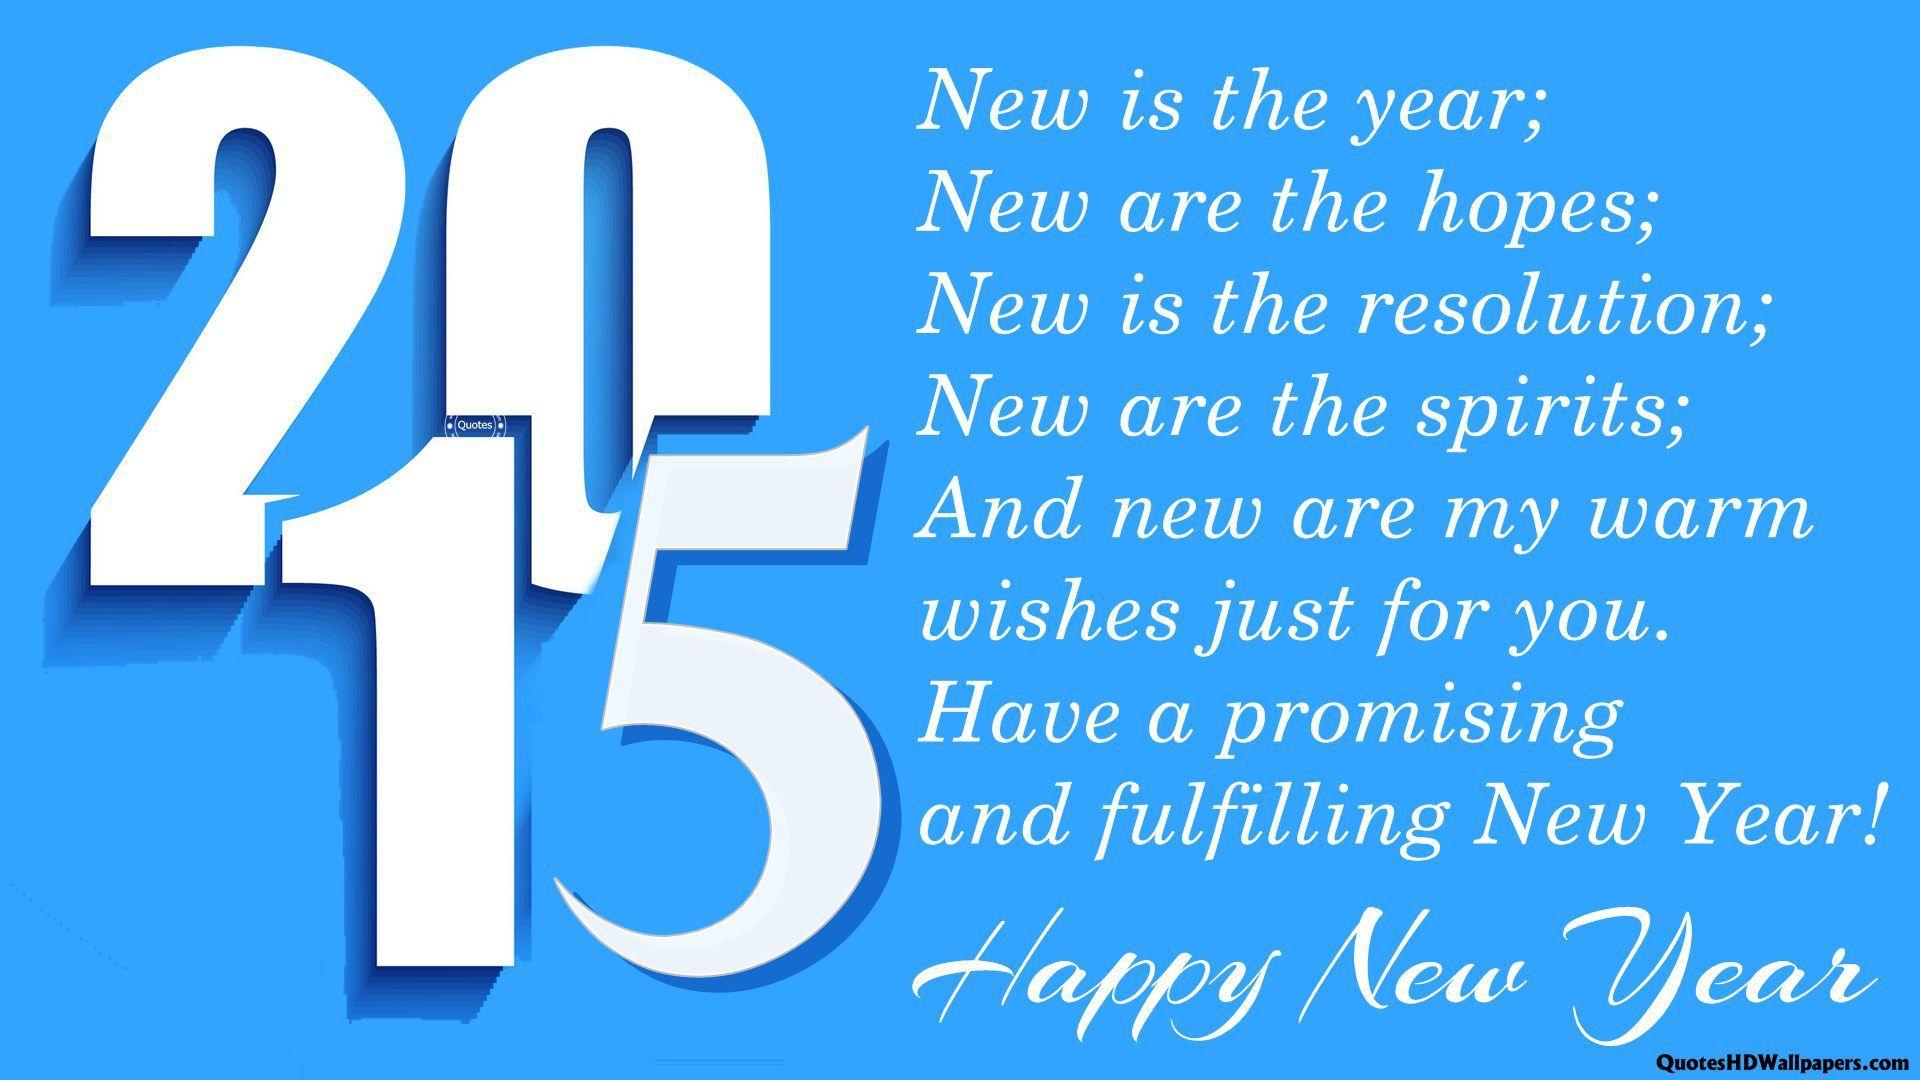 happy-new-year-2015-greetings-hd